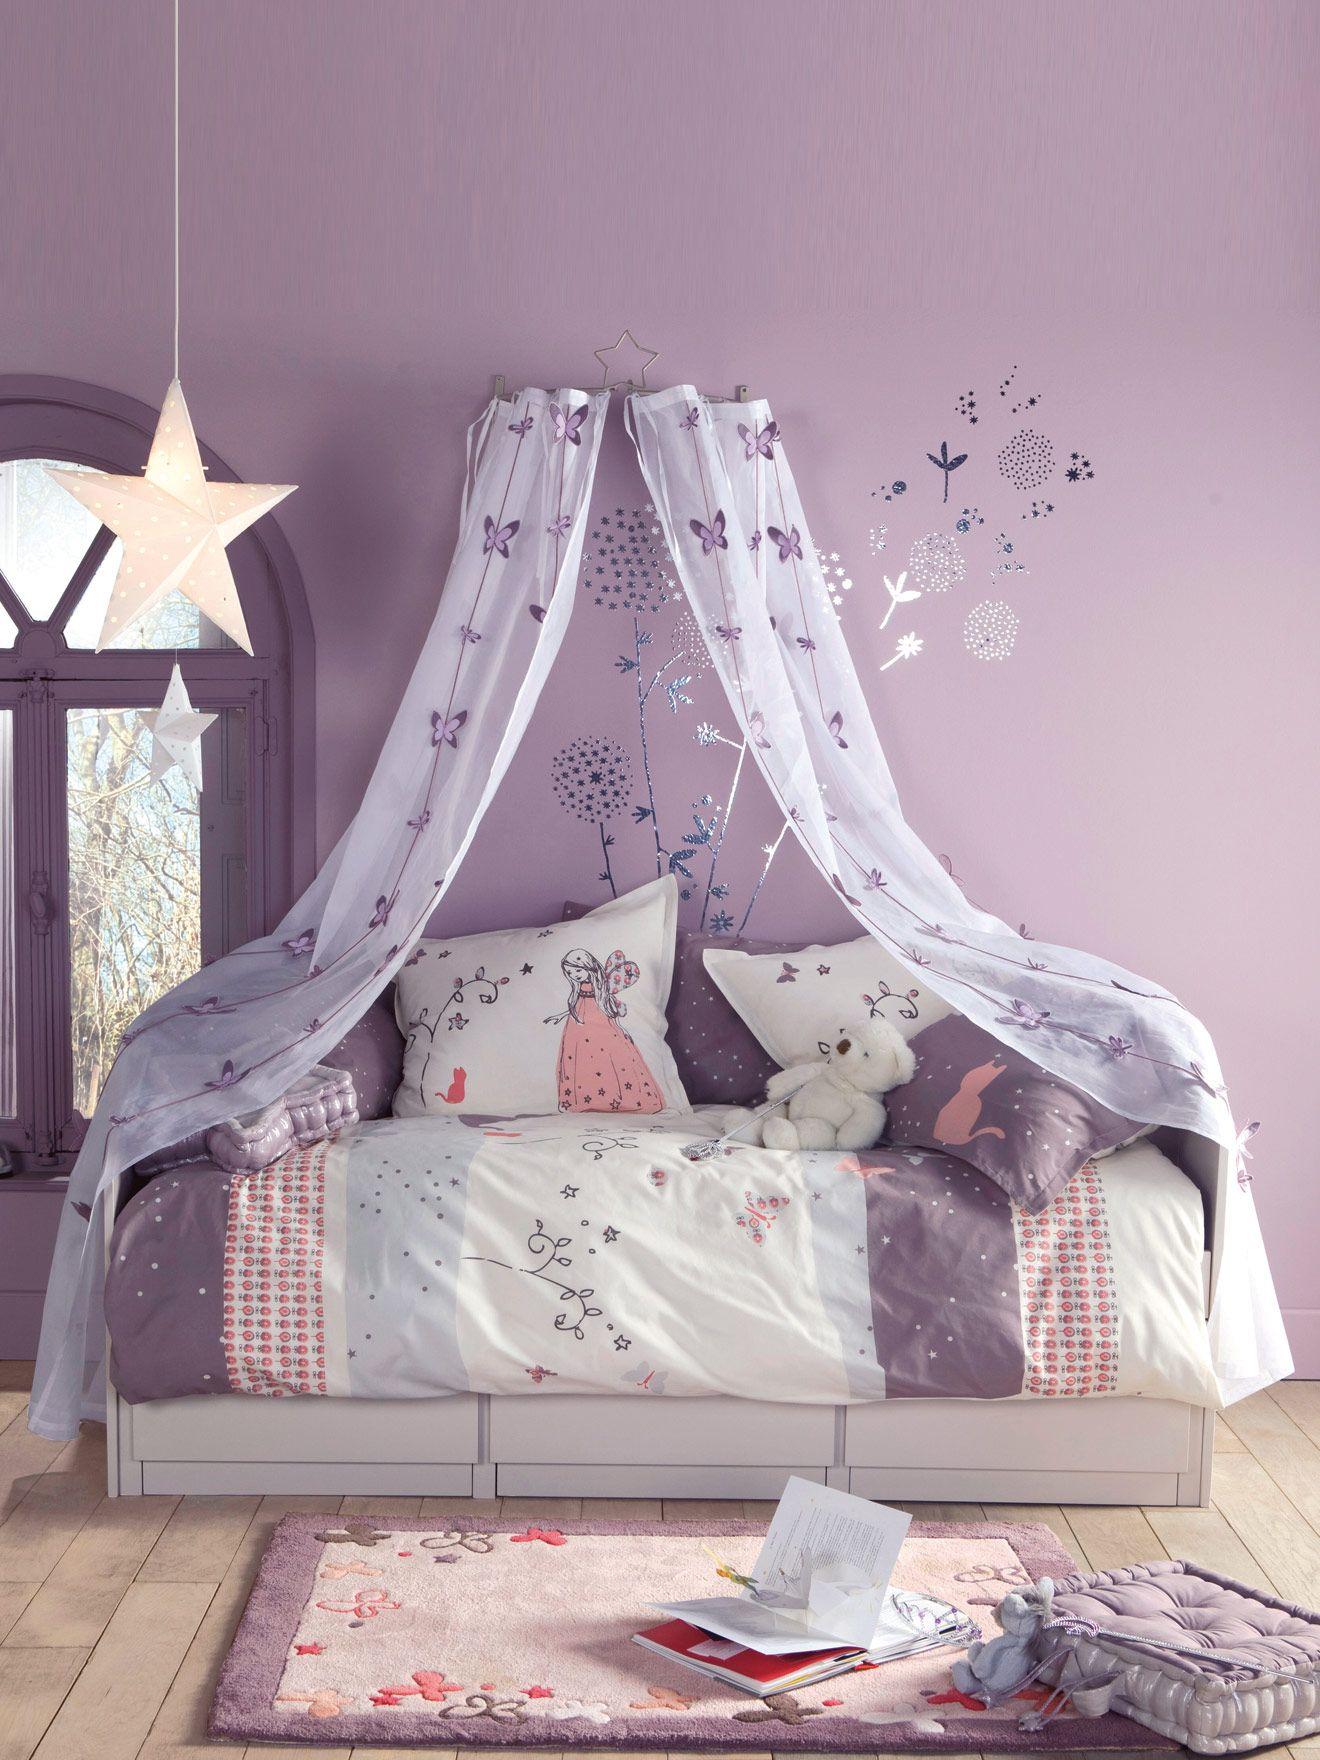 mädchenzimmer, himmelbett, sterne | Mädchenzimmer | Pinterest ...